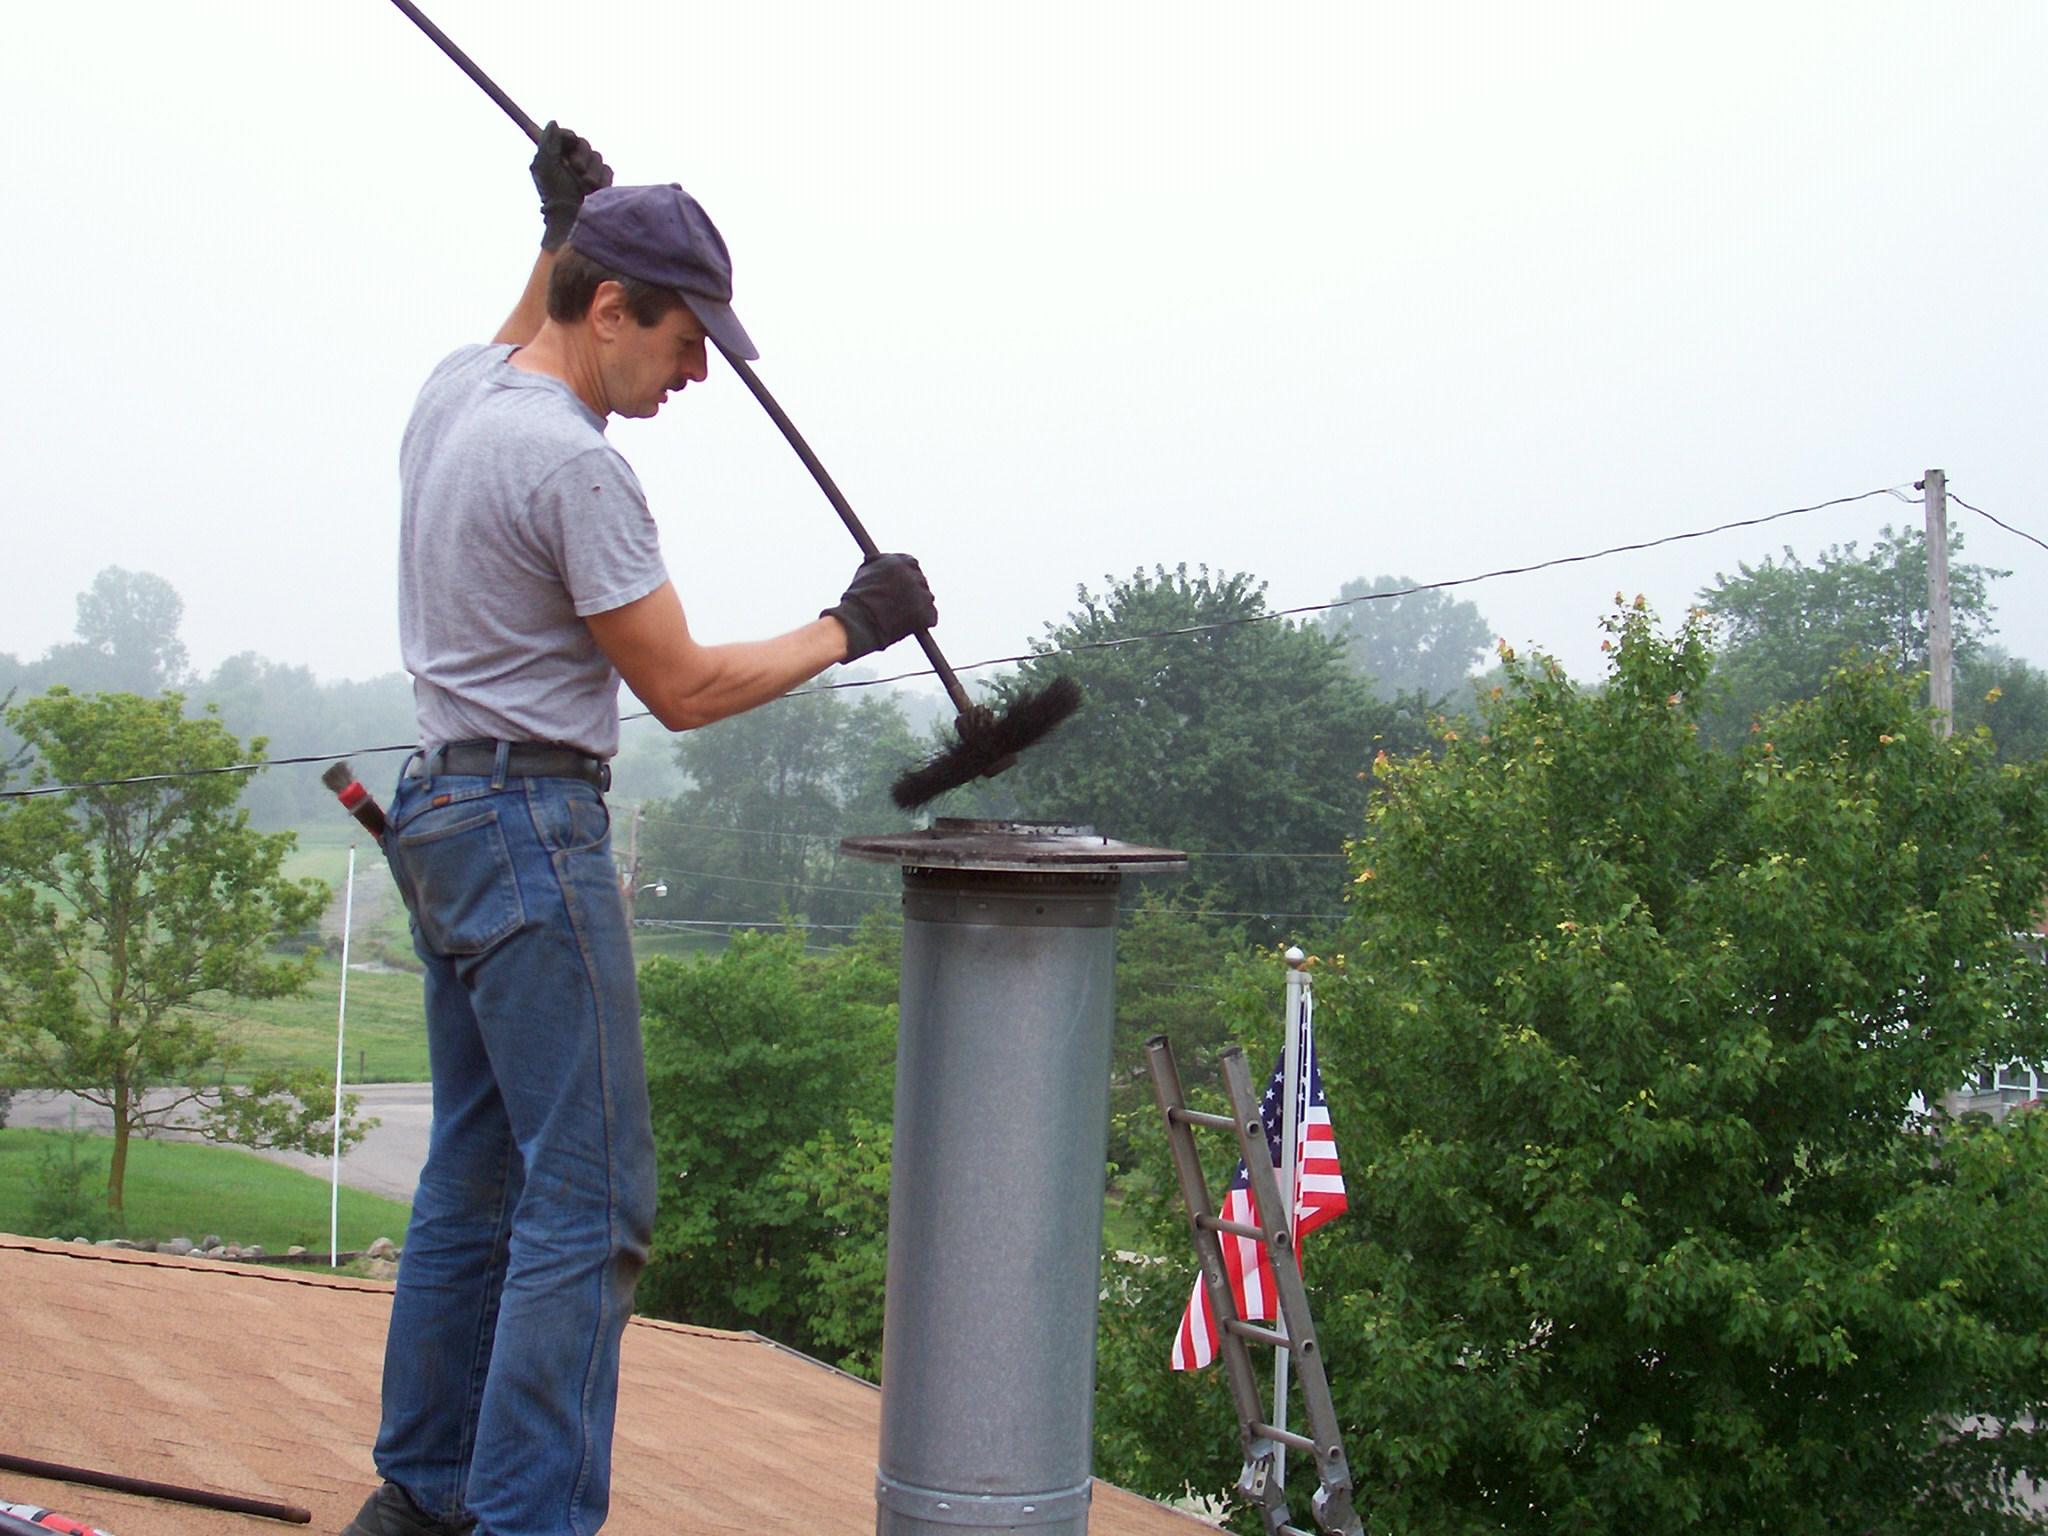 https://www.suffieldhardware.com/wp-content/uploads/2016/11/chimney-sweep.jpg